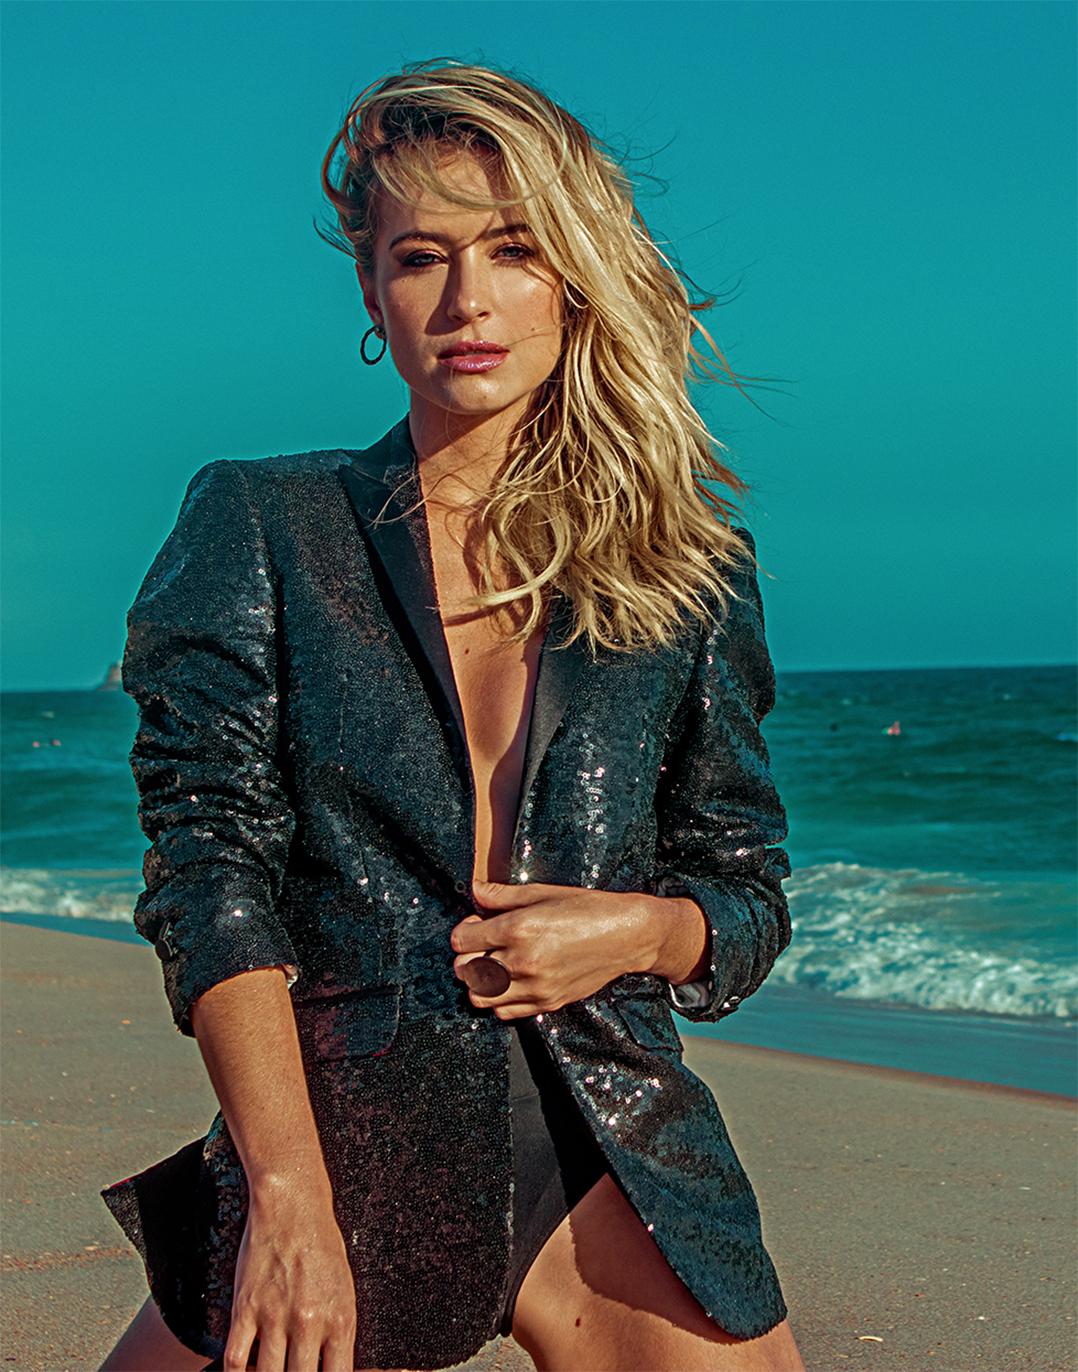 Barbara França